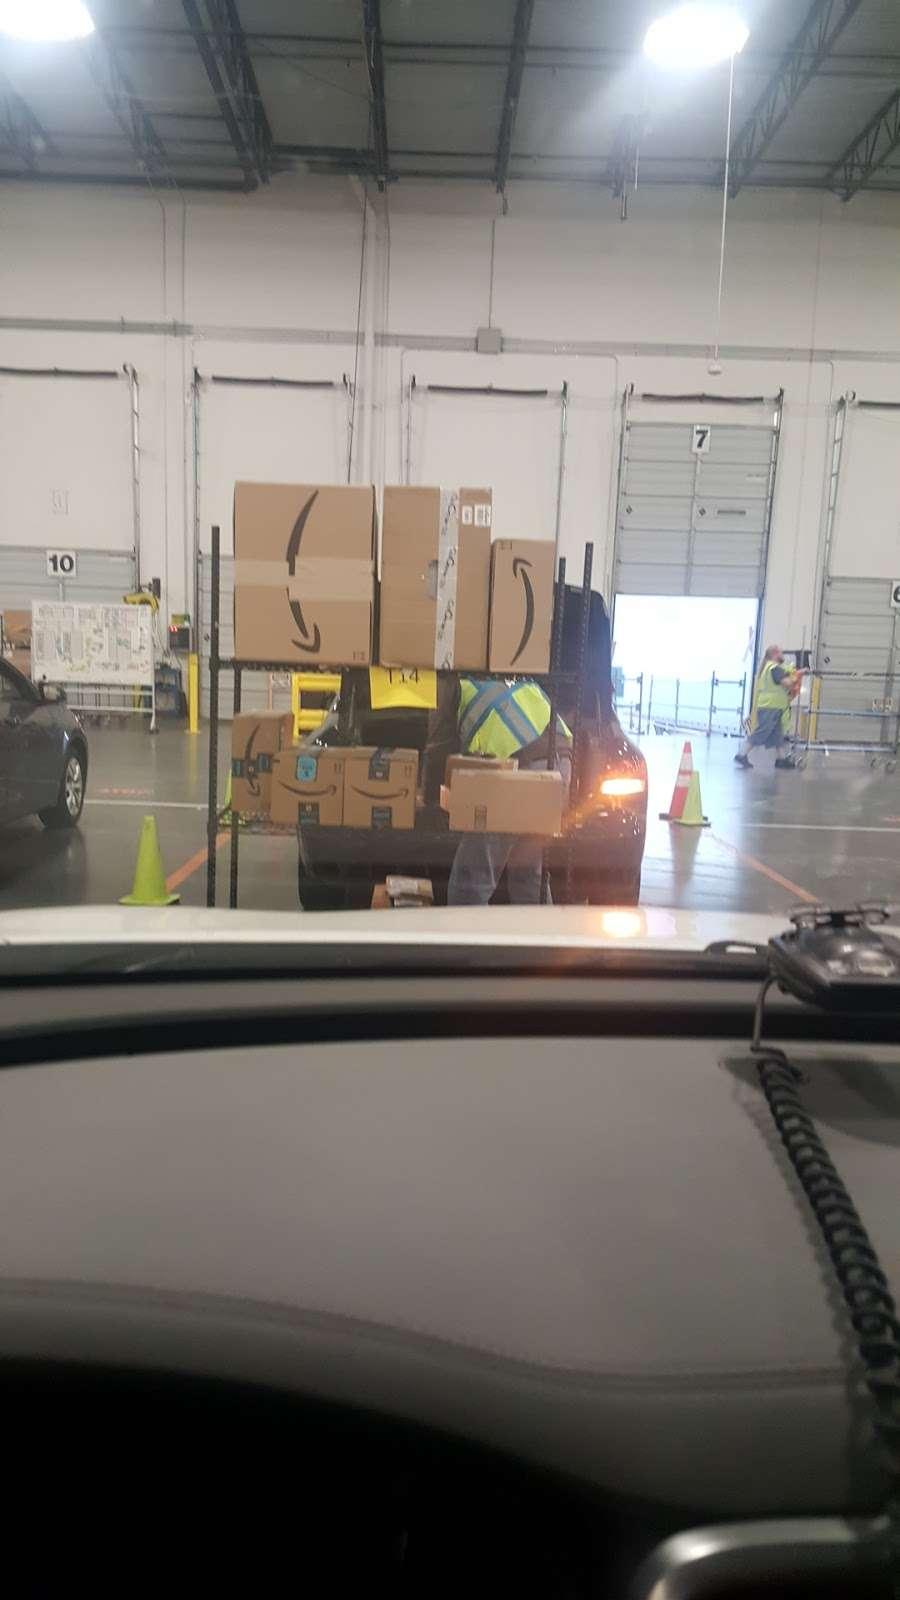 Amazon Flex Farmers Branch - storage  | Photo 5 of 10 | Address: 12401 N Stemmons Fwy, Farmers Branch, TX 75234, USA